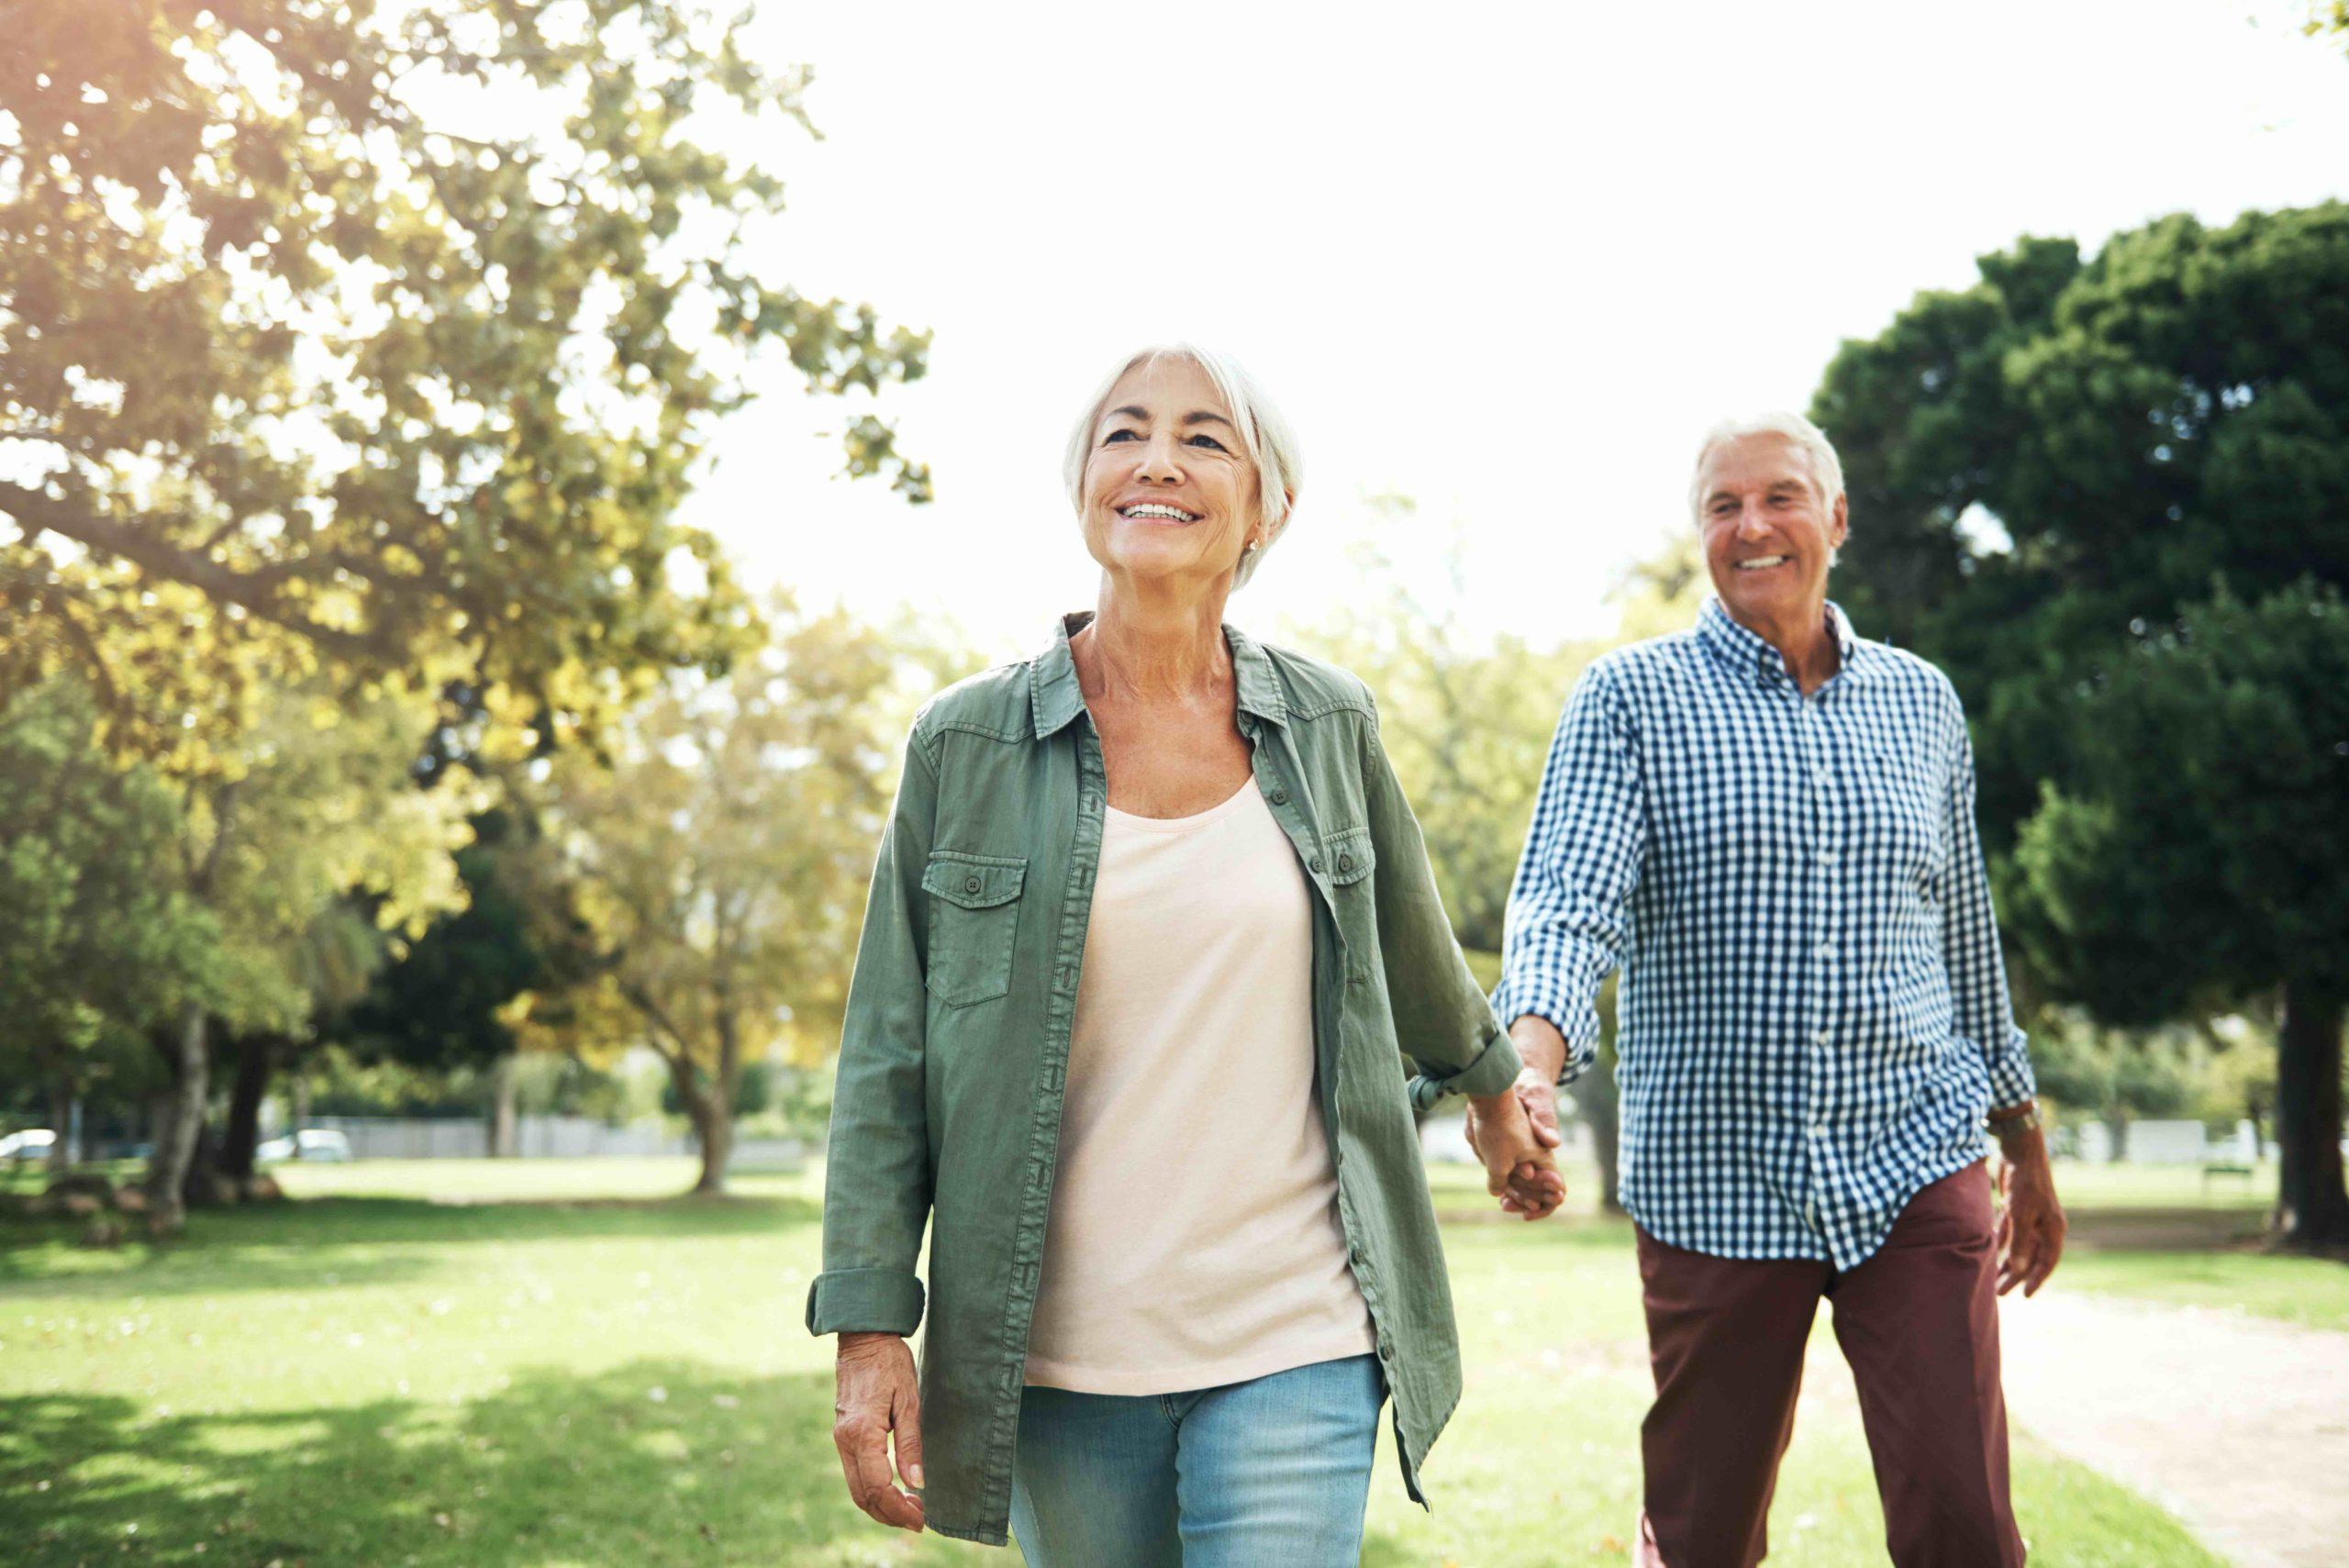 Happy senior couple enjoying walk in the park